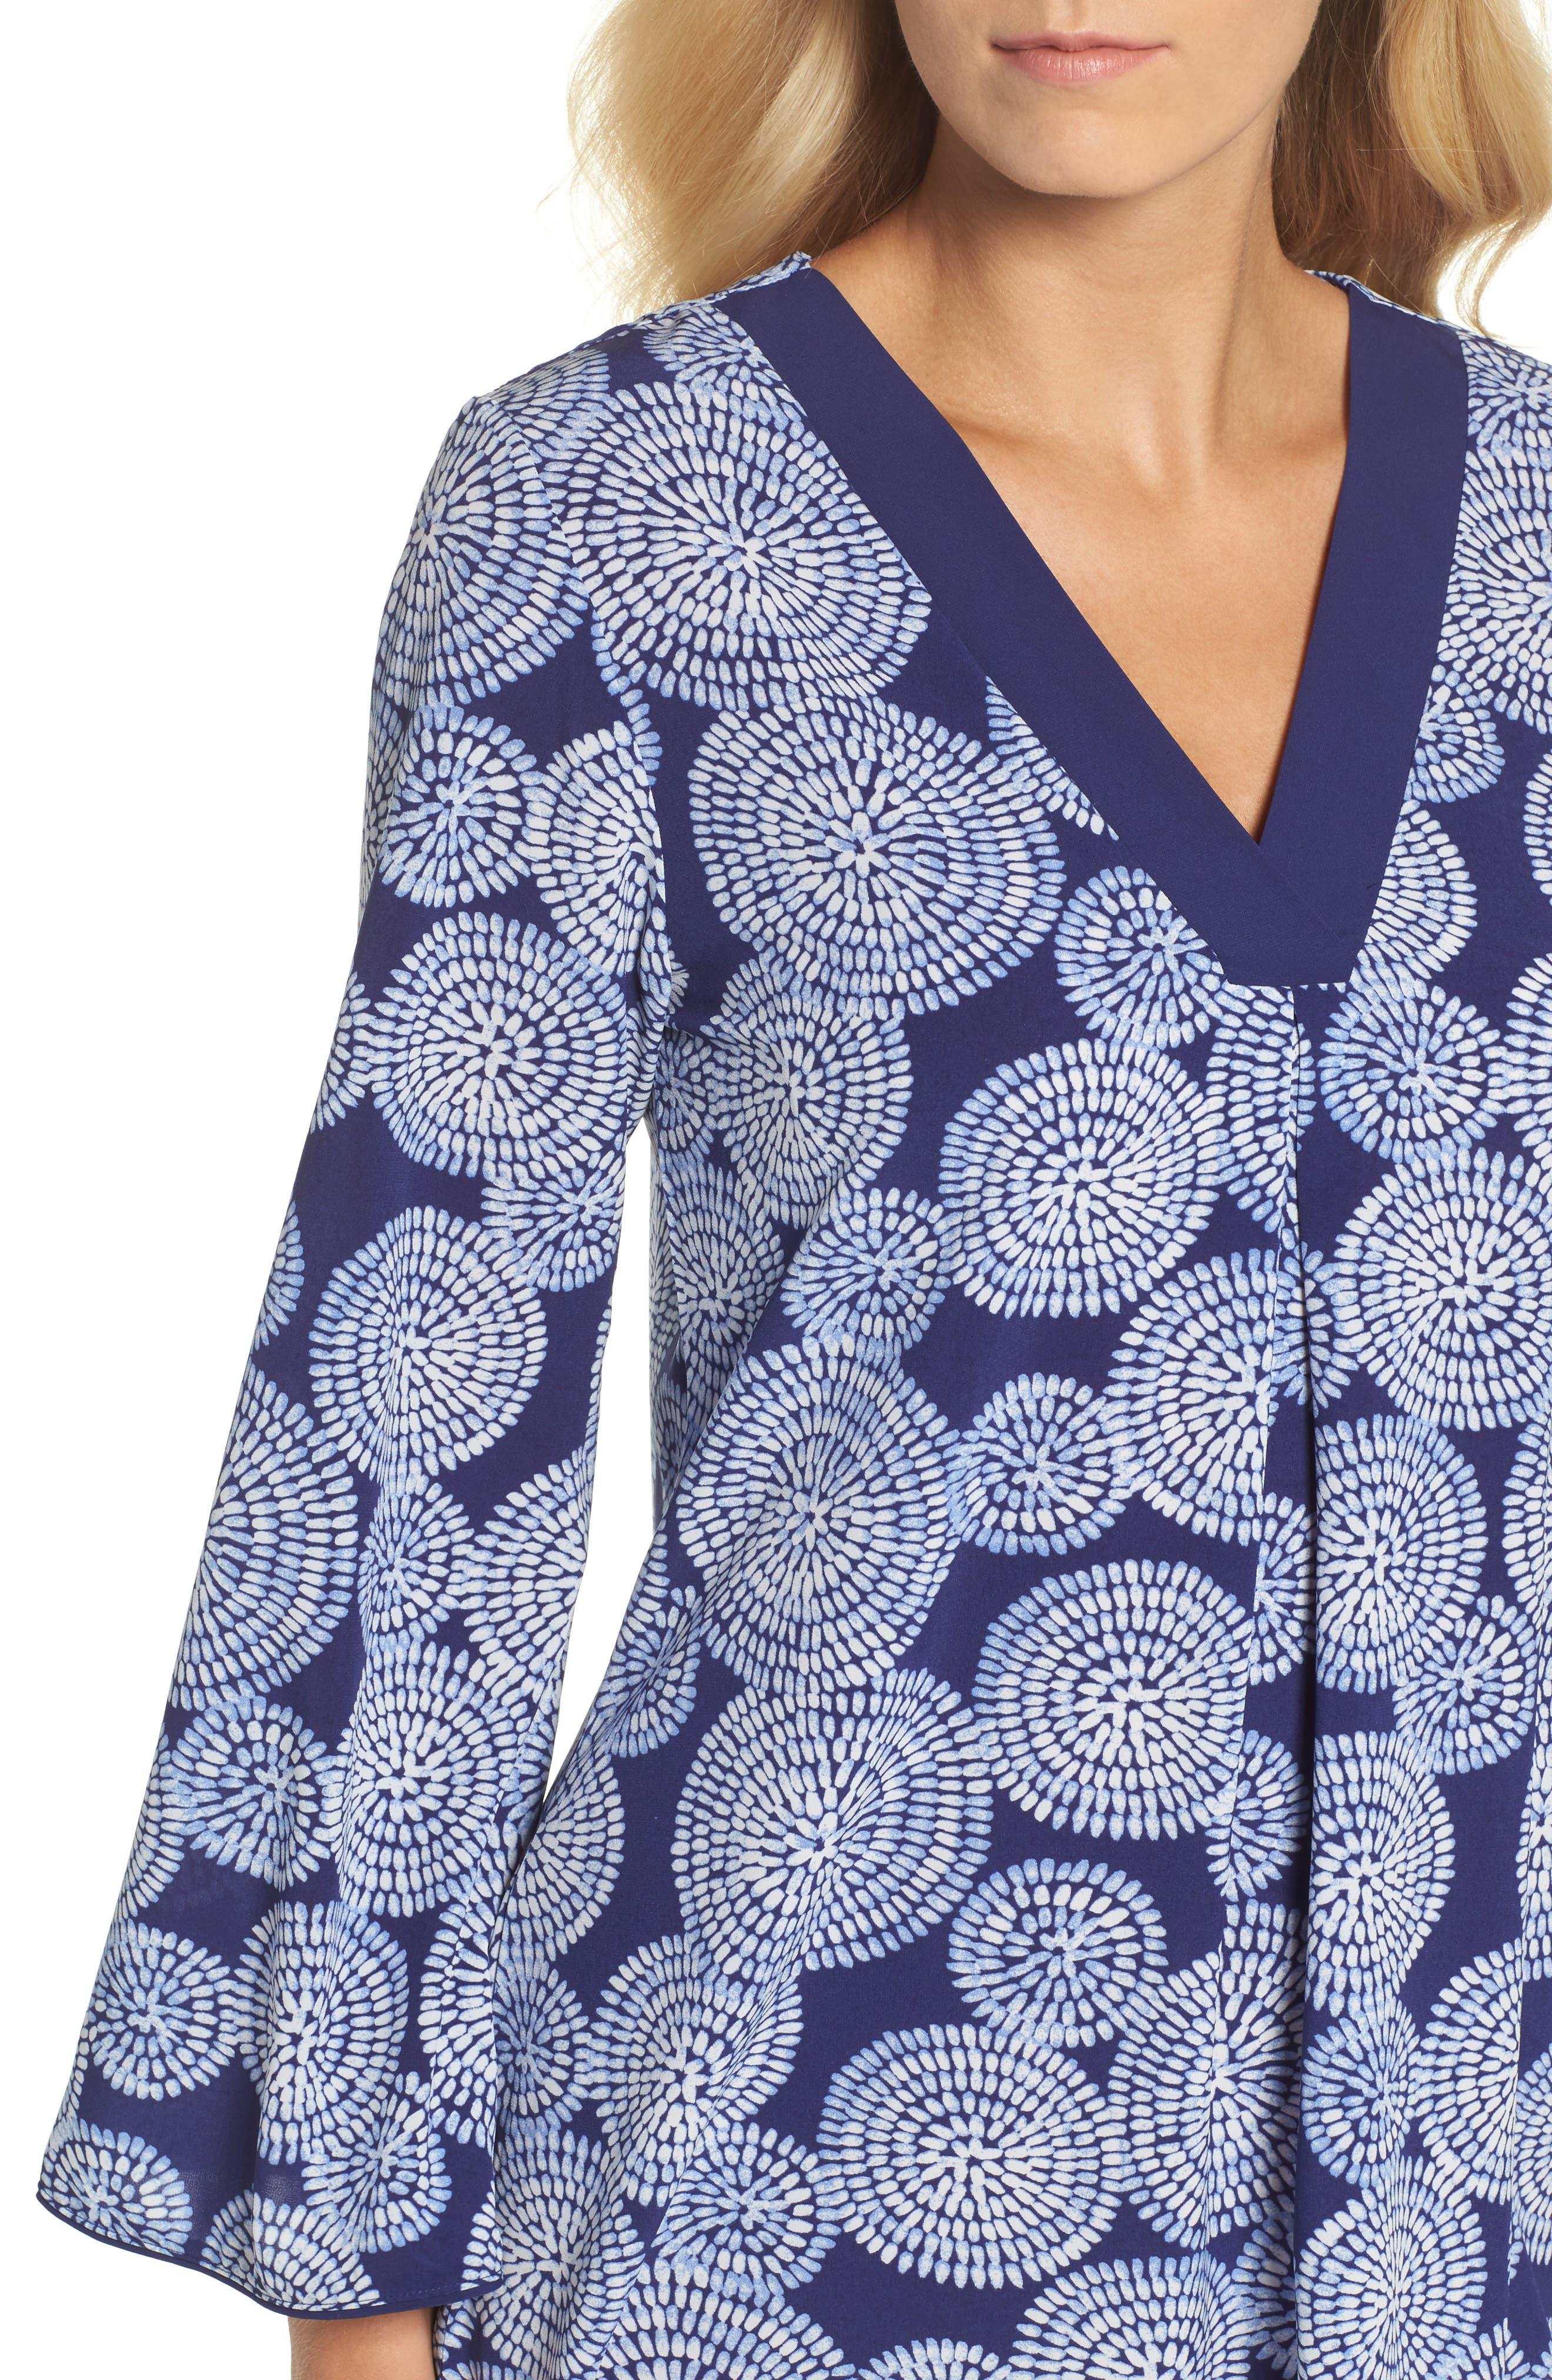 Sleepwear Halftan Short Nightgown,                             Alternate thumbnail 5, color,                             Eclipse Print